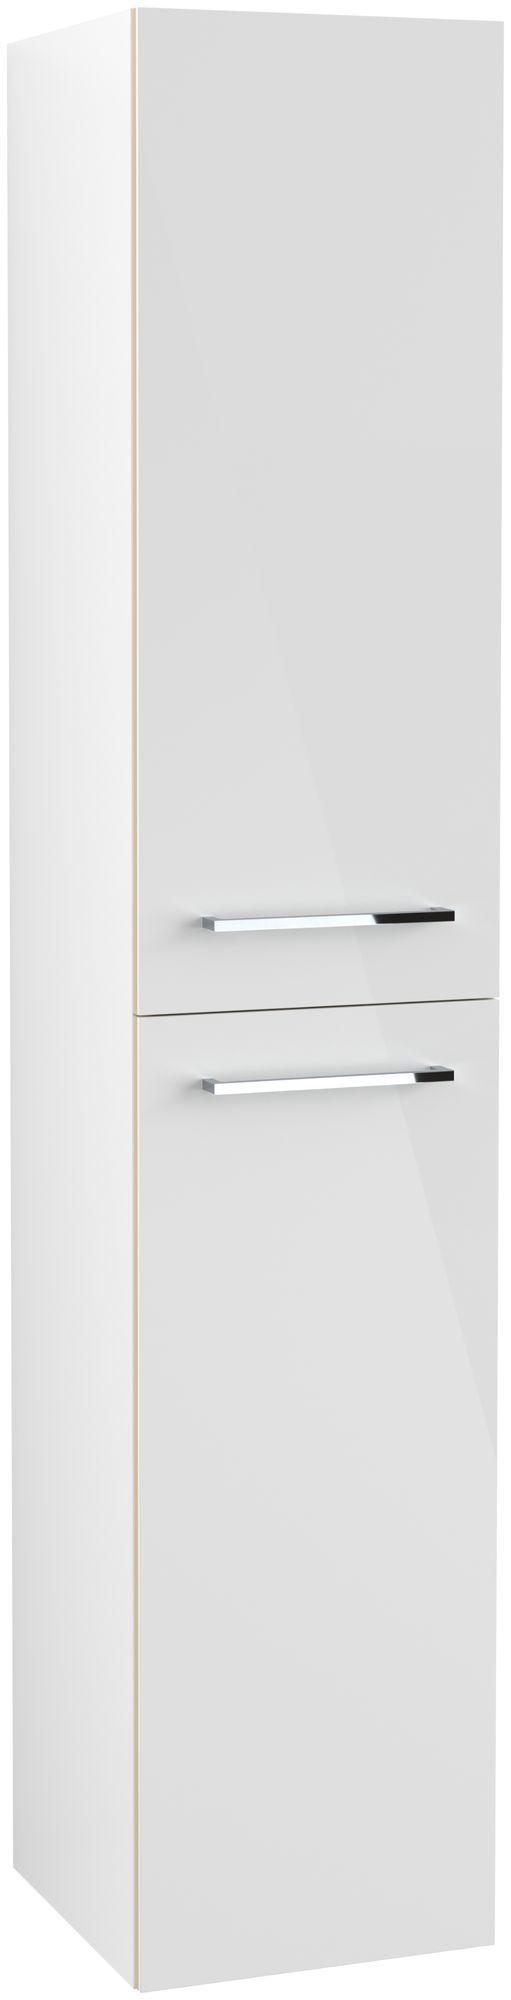 Villeroy & Boch Avento Hochschrank Türanschlag rechts B:35 x H:176 x T:37 cm crystal white A89401B4